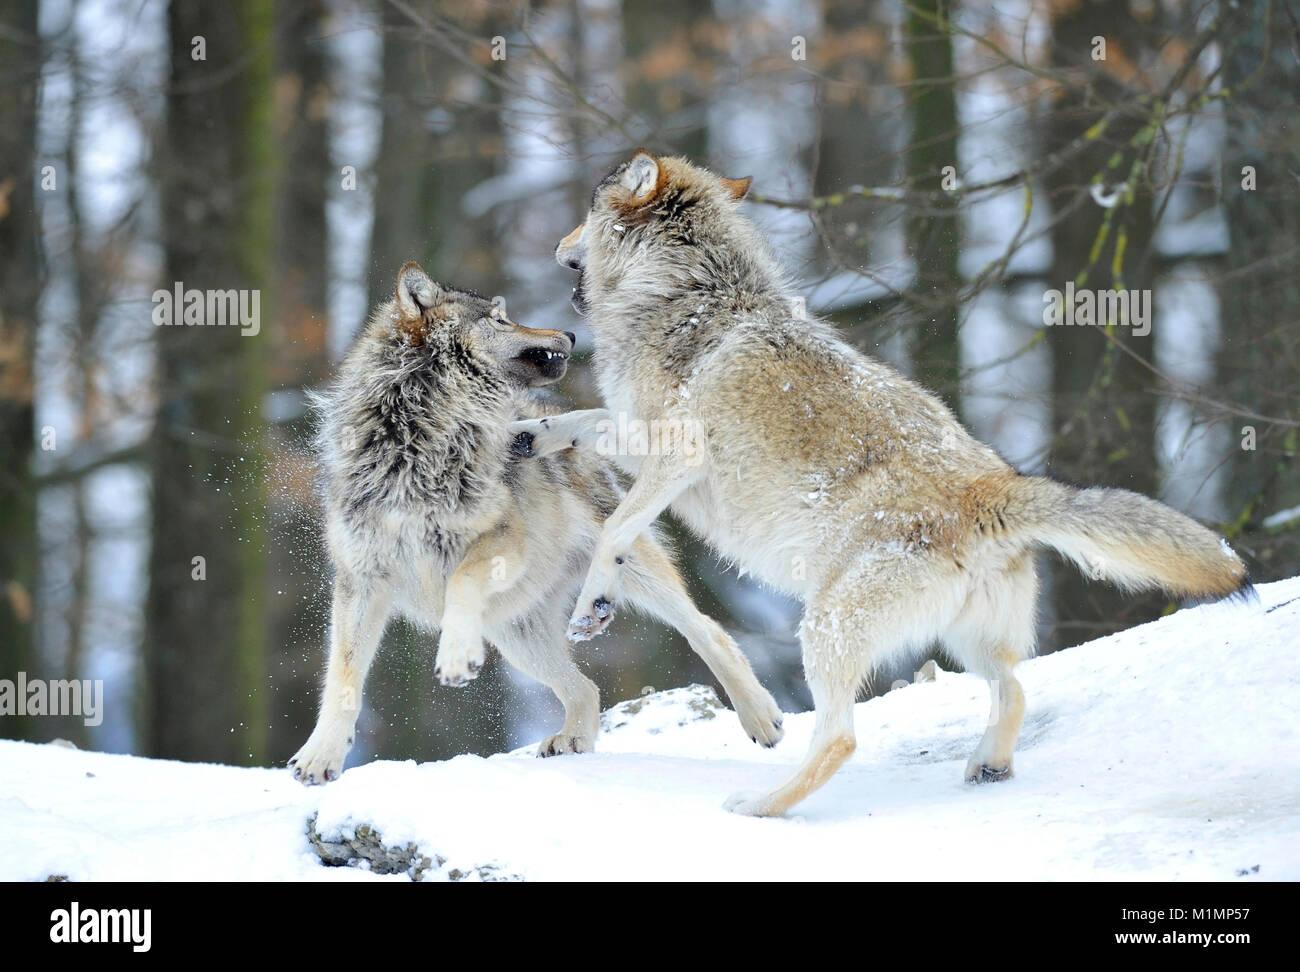 Lobo Timber Wolf Canis lupus, el lobo Canis lupus Timberwolf Foto de stock